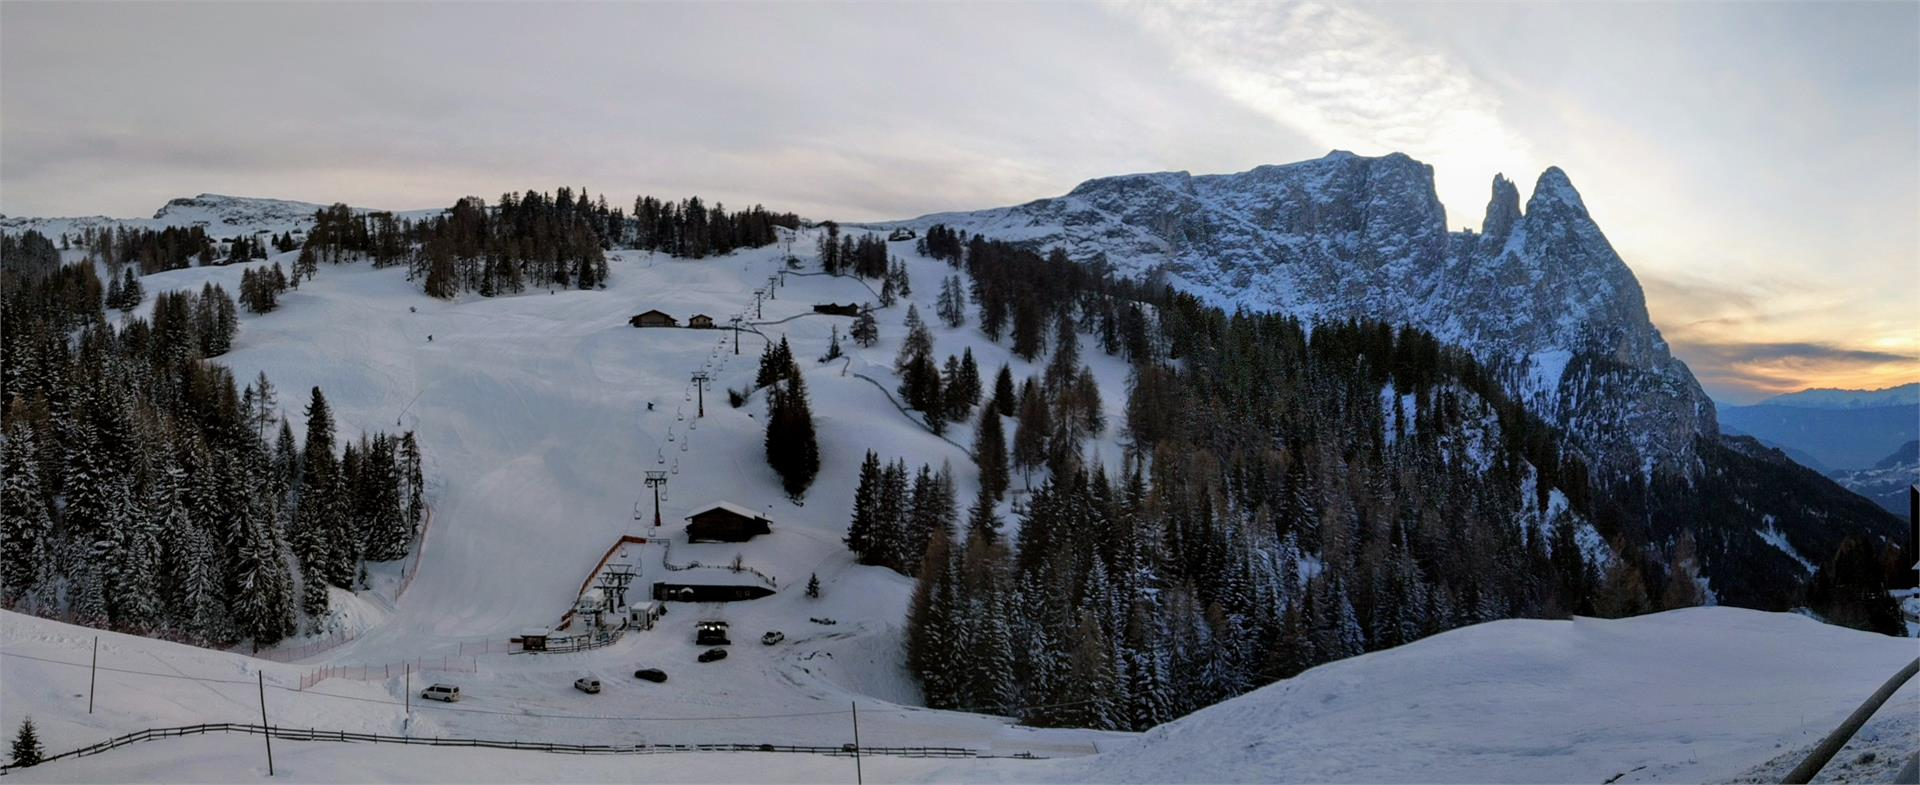 Skilift Spitzbühl